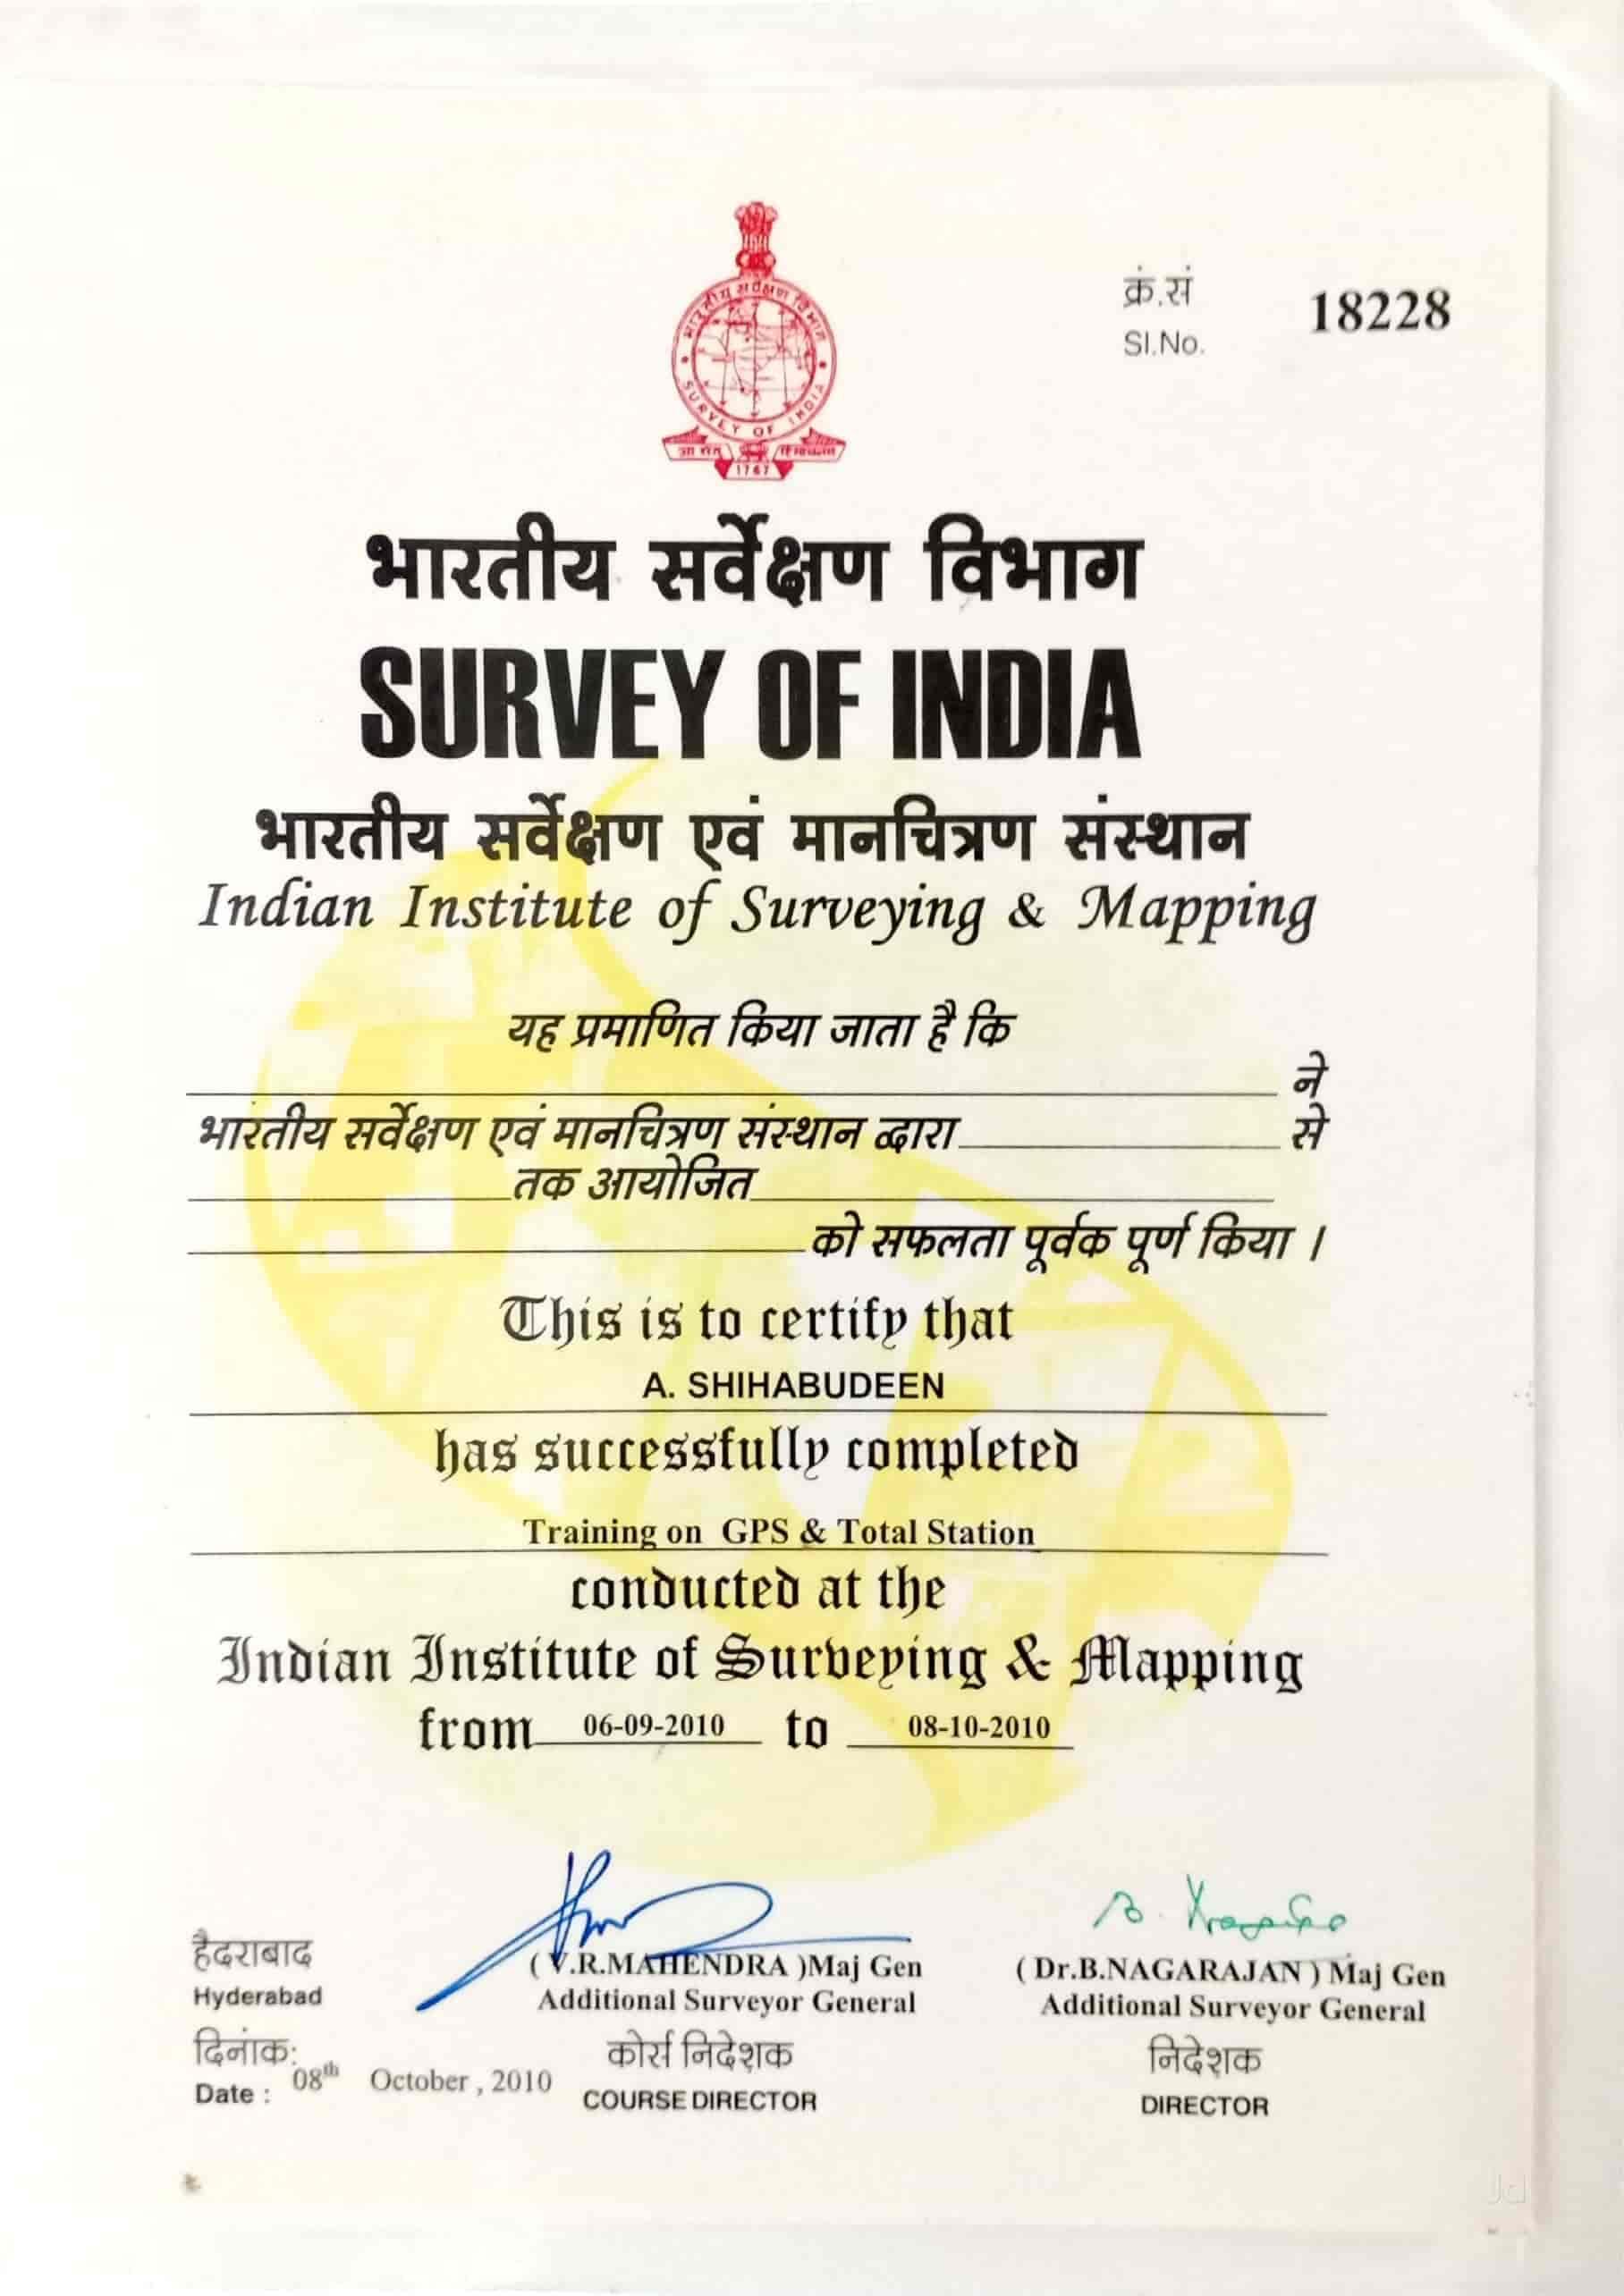 Axis Digital Survey & Training Centre, Karunagappally - Land